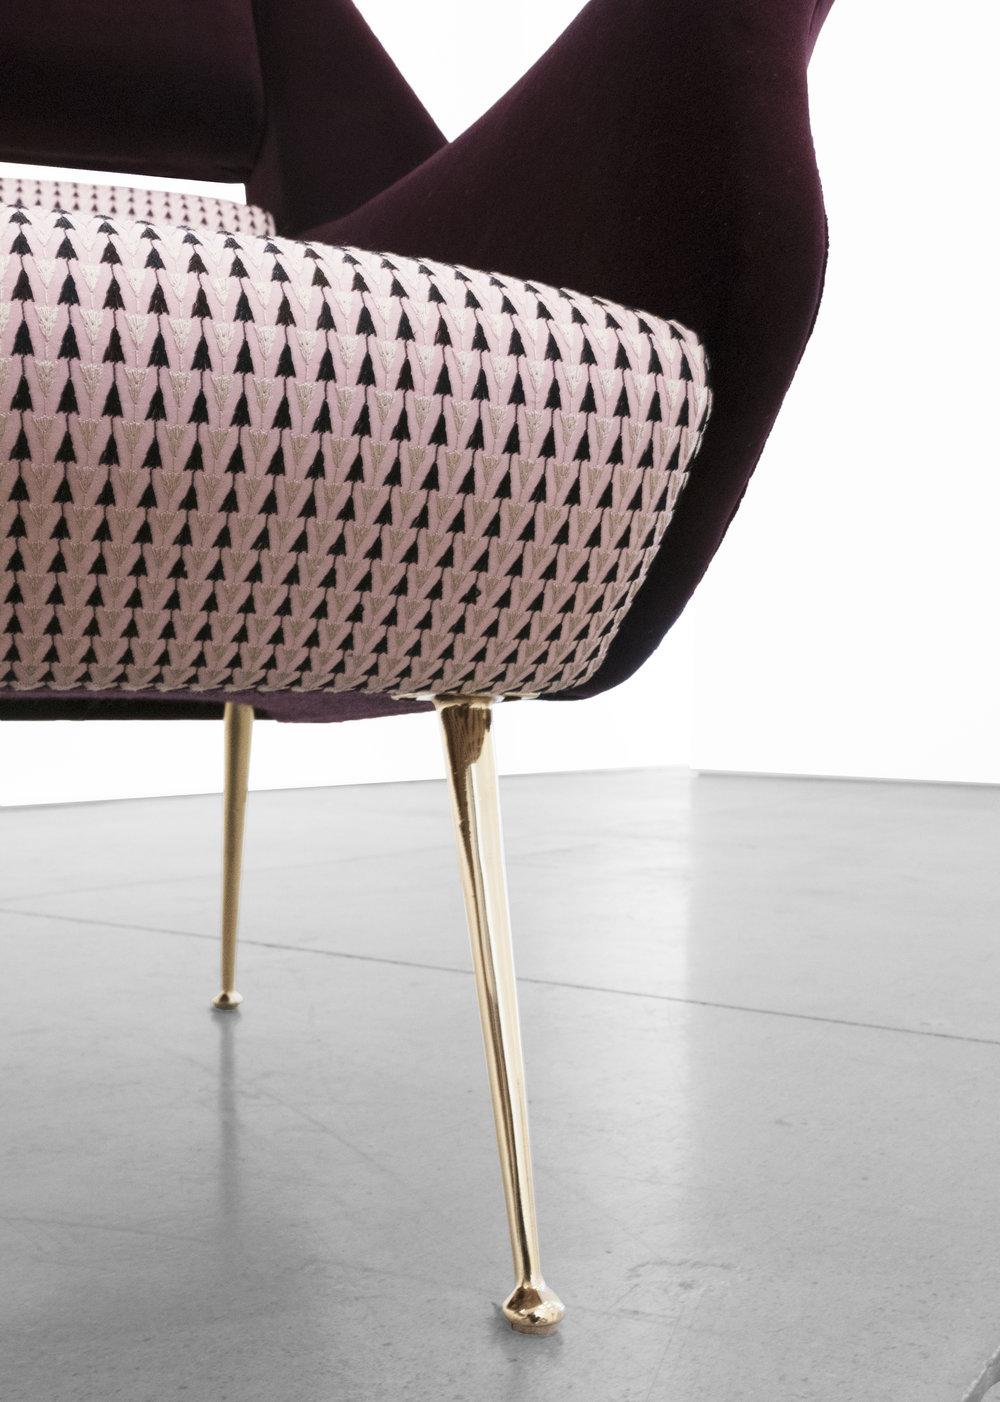 Gigi Radice, Chairs for Minotti, c. 1950 - 1959, Brass, Dedar Milano Upholstery, 31 H x 28 W x 29 D inches_6.jpg